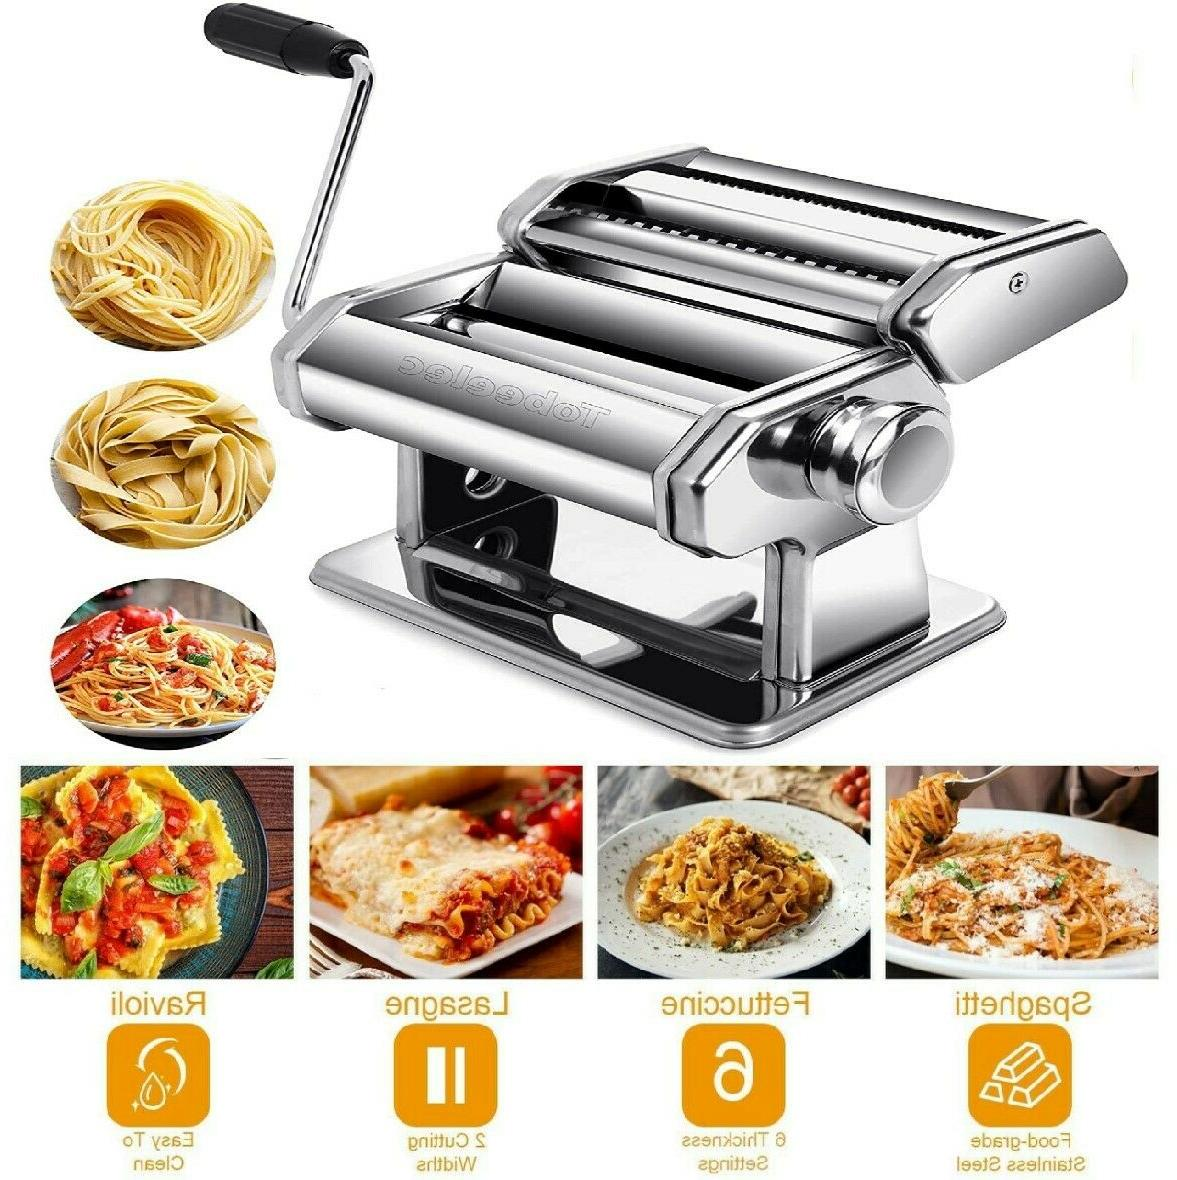 stainless steel pasta machine lasagna spaghetti tagliatelle